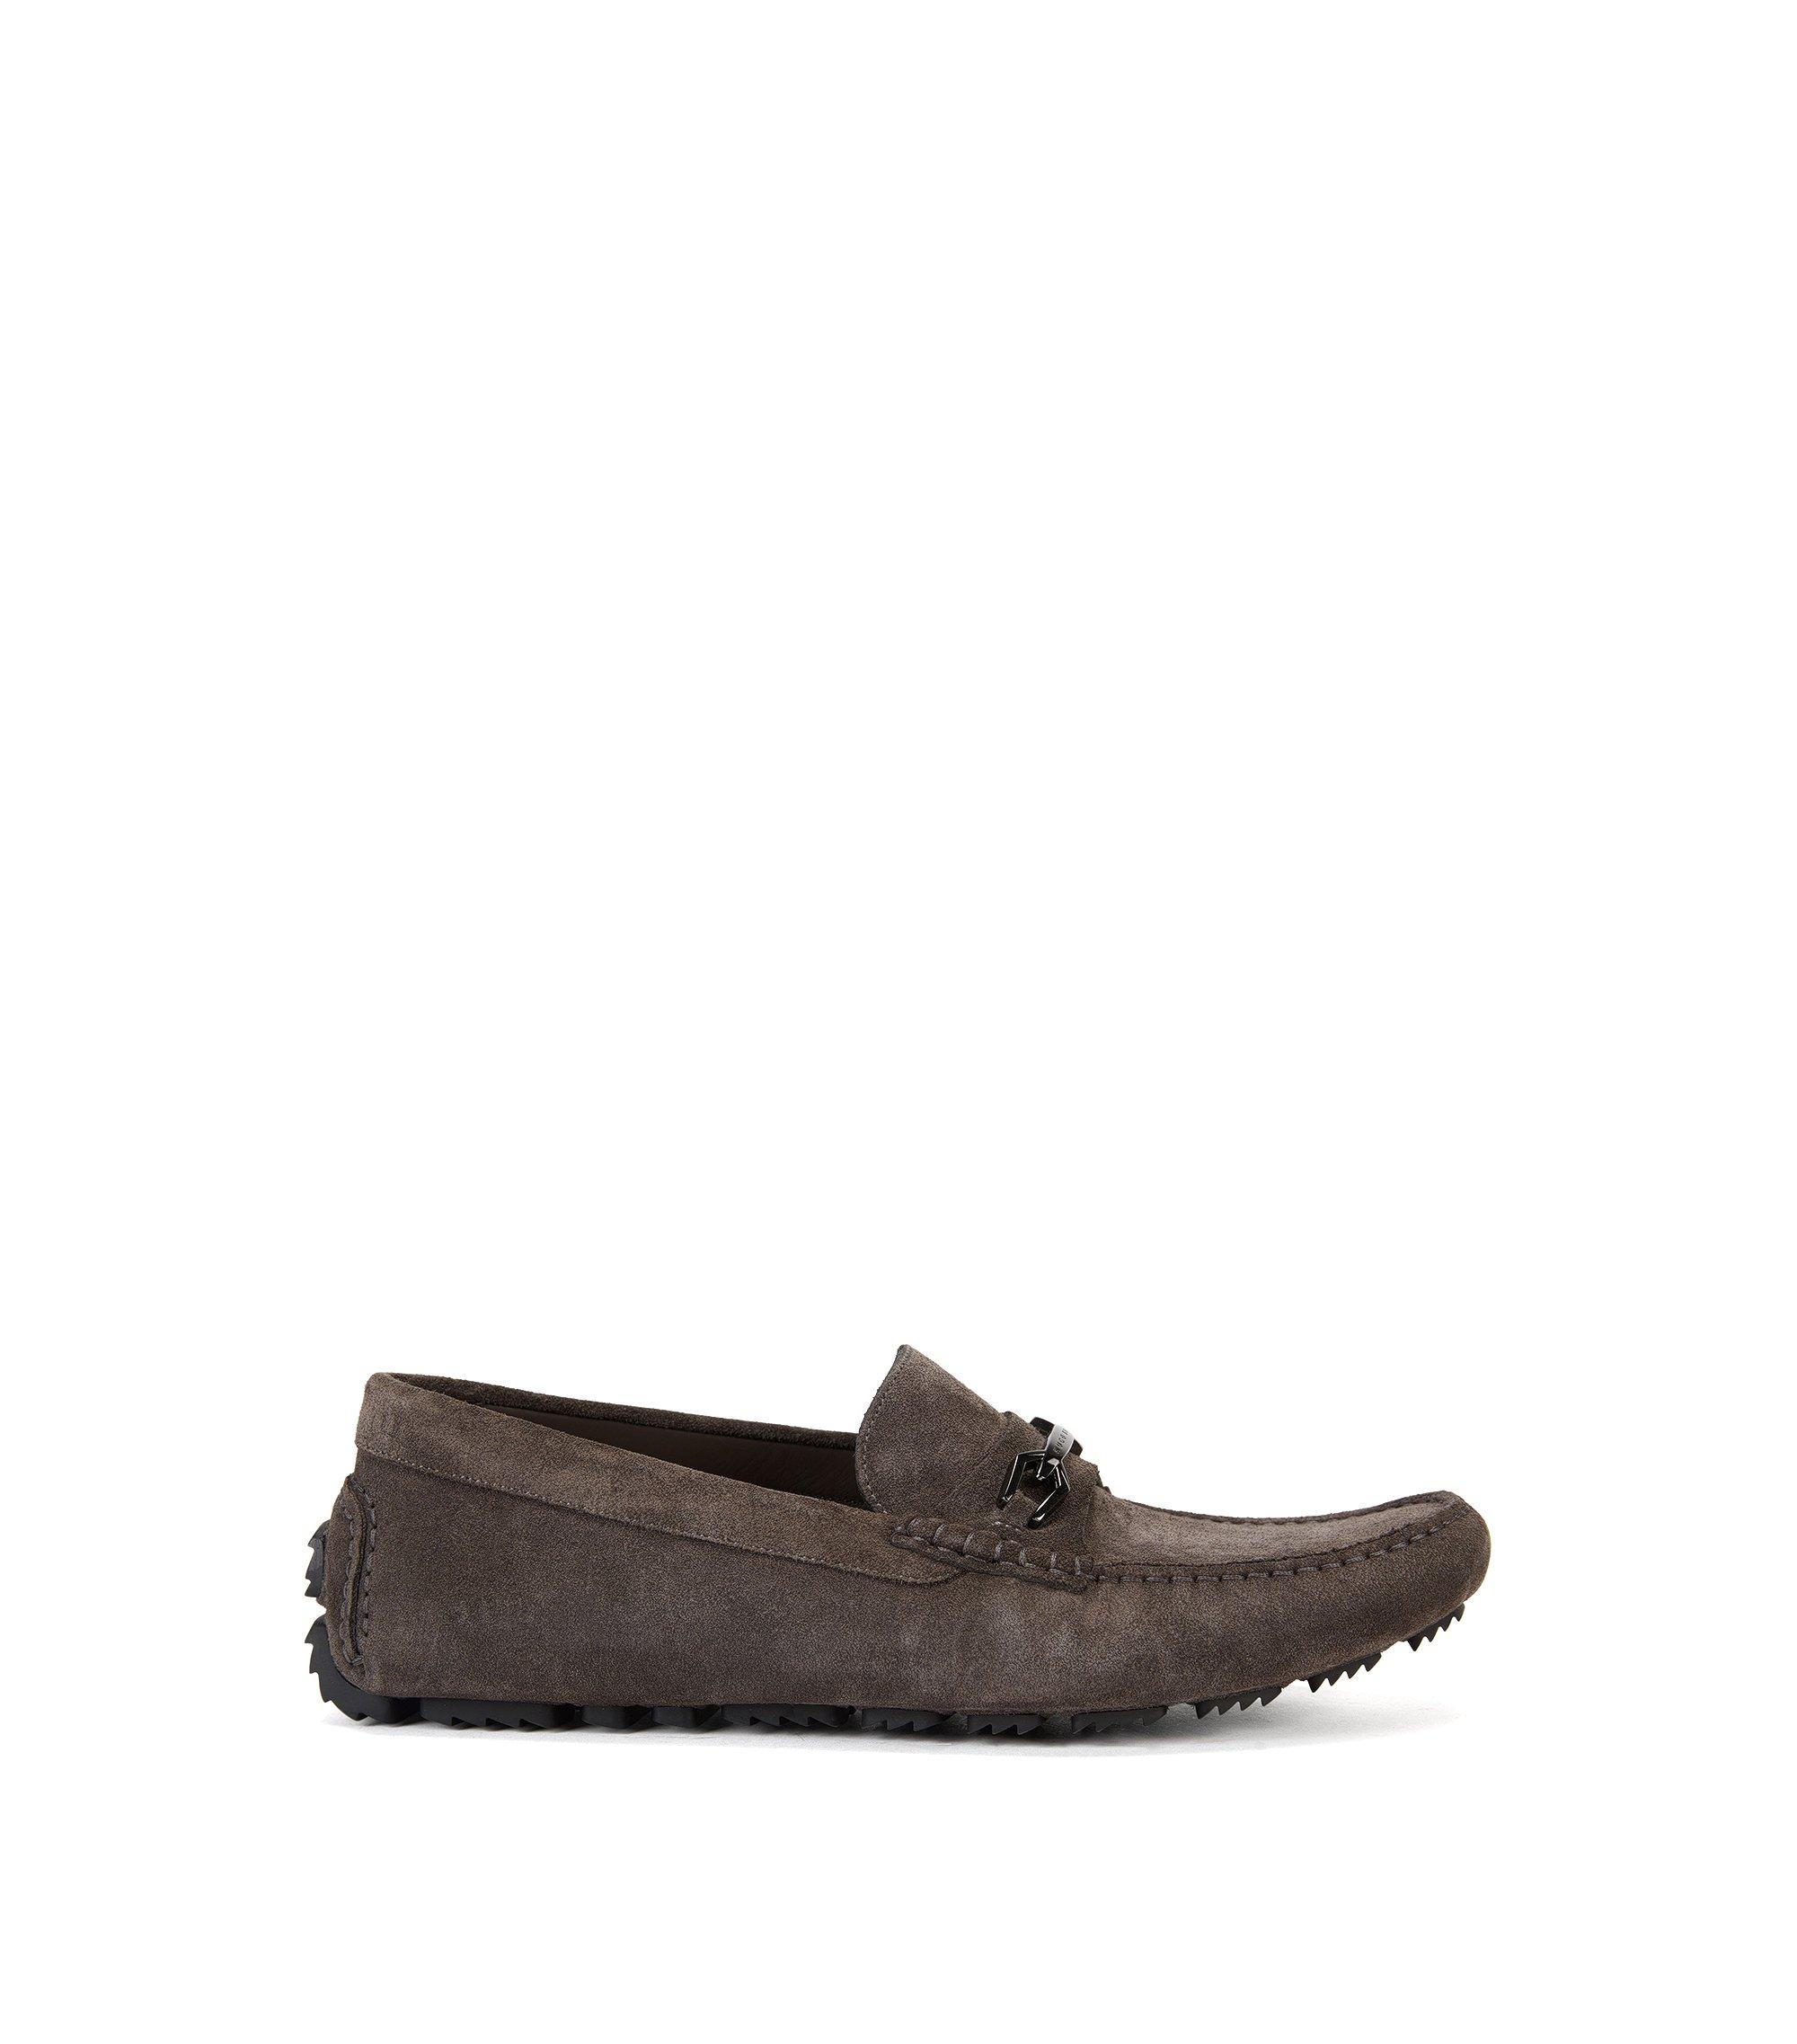 Veloursleder-Schuhe mit Metall-Detail, Dunkelgrau